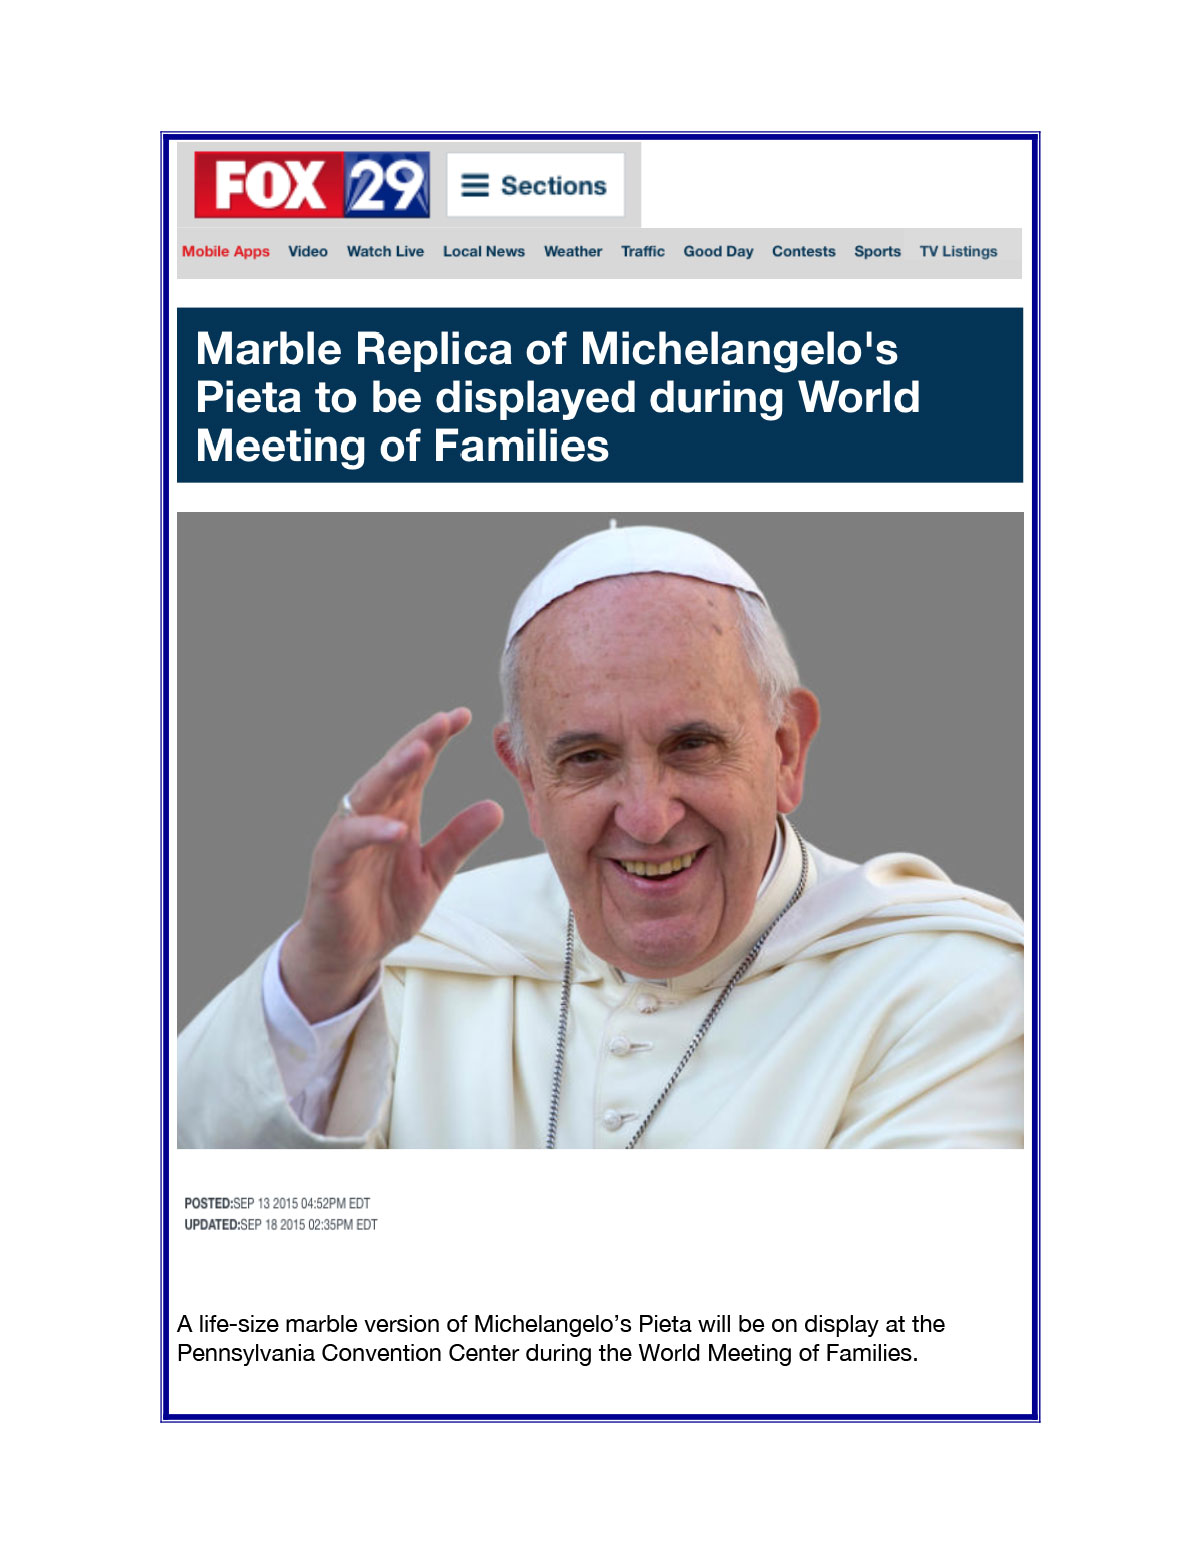 Fox News World Meeting of Families Sep 13 2015